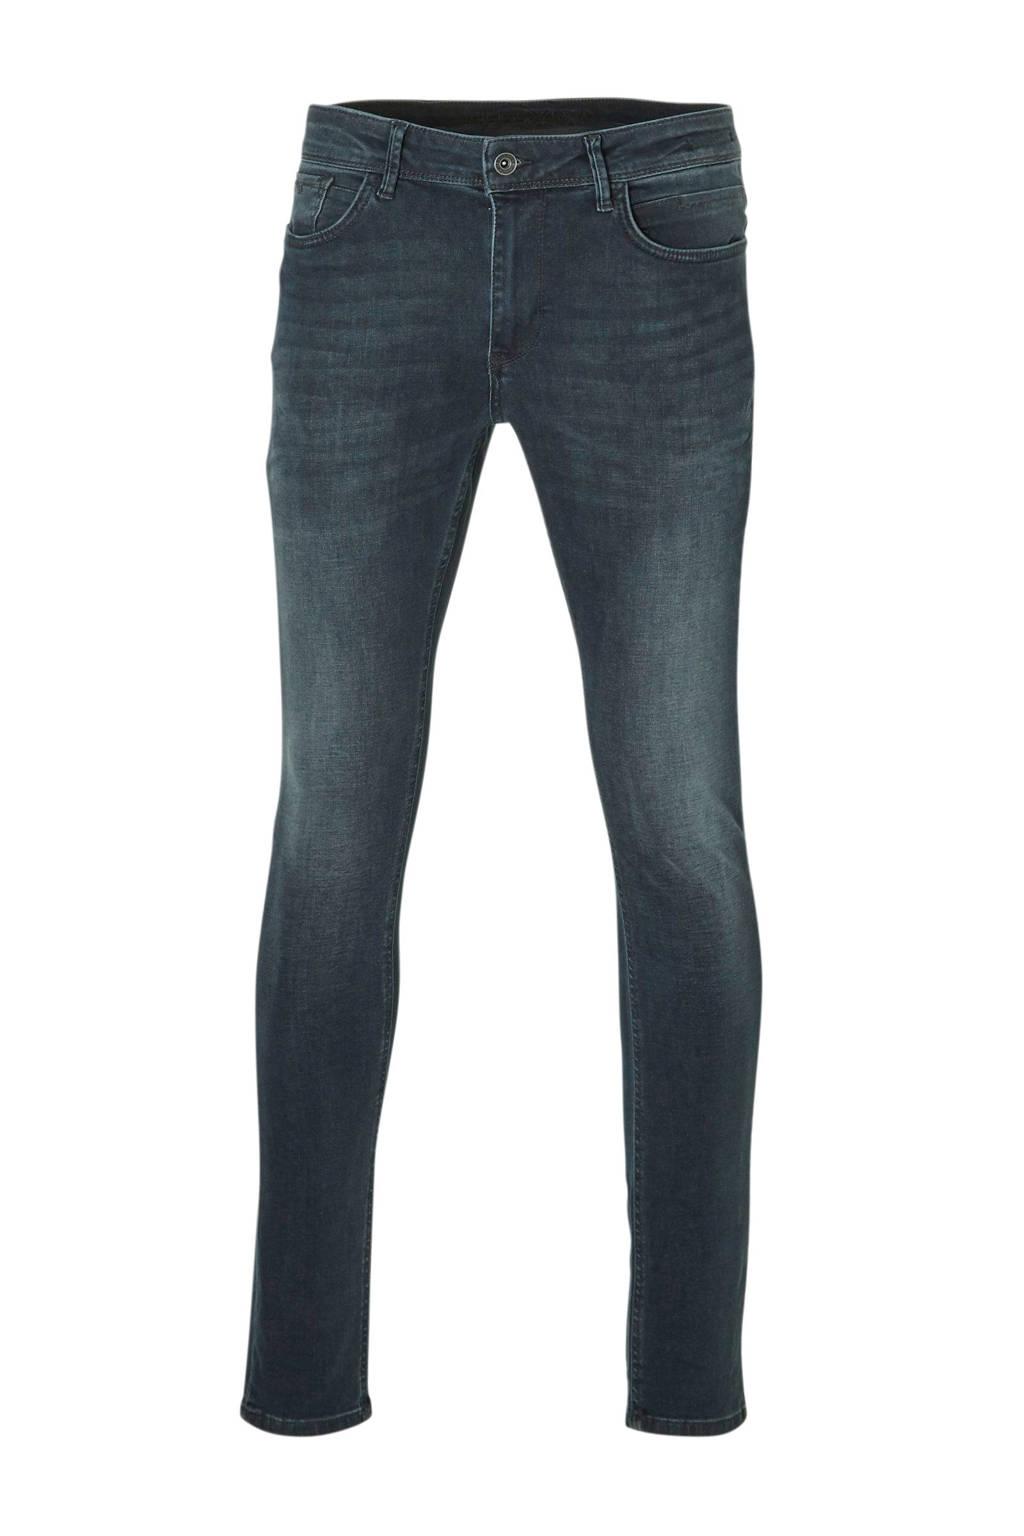 Purewhite regular fit jeans, Donkerblauw